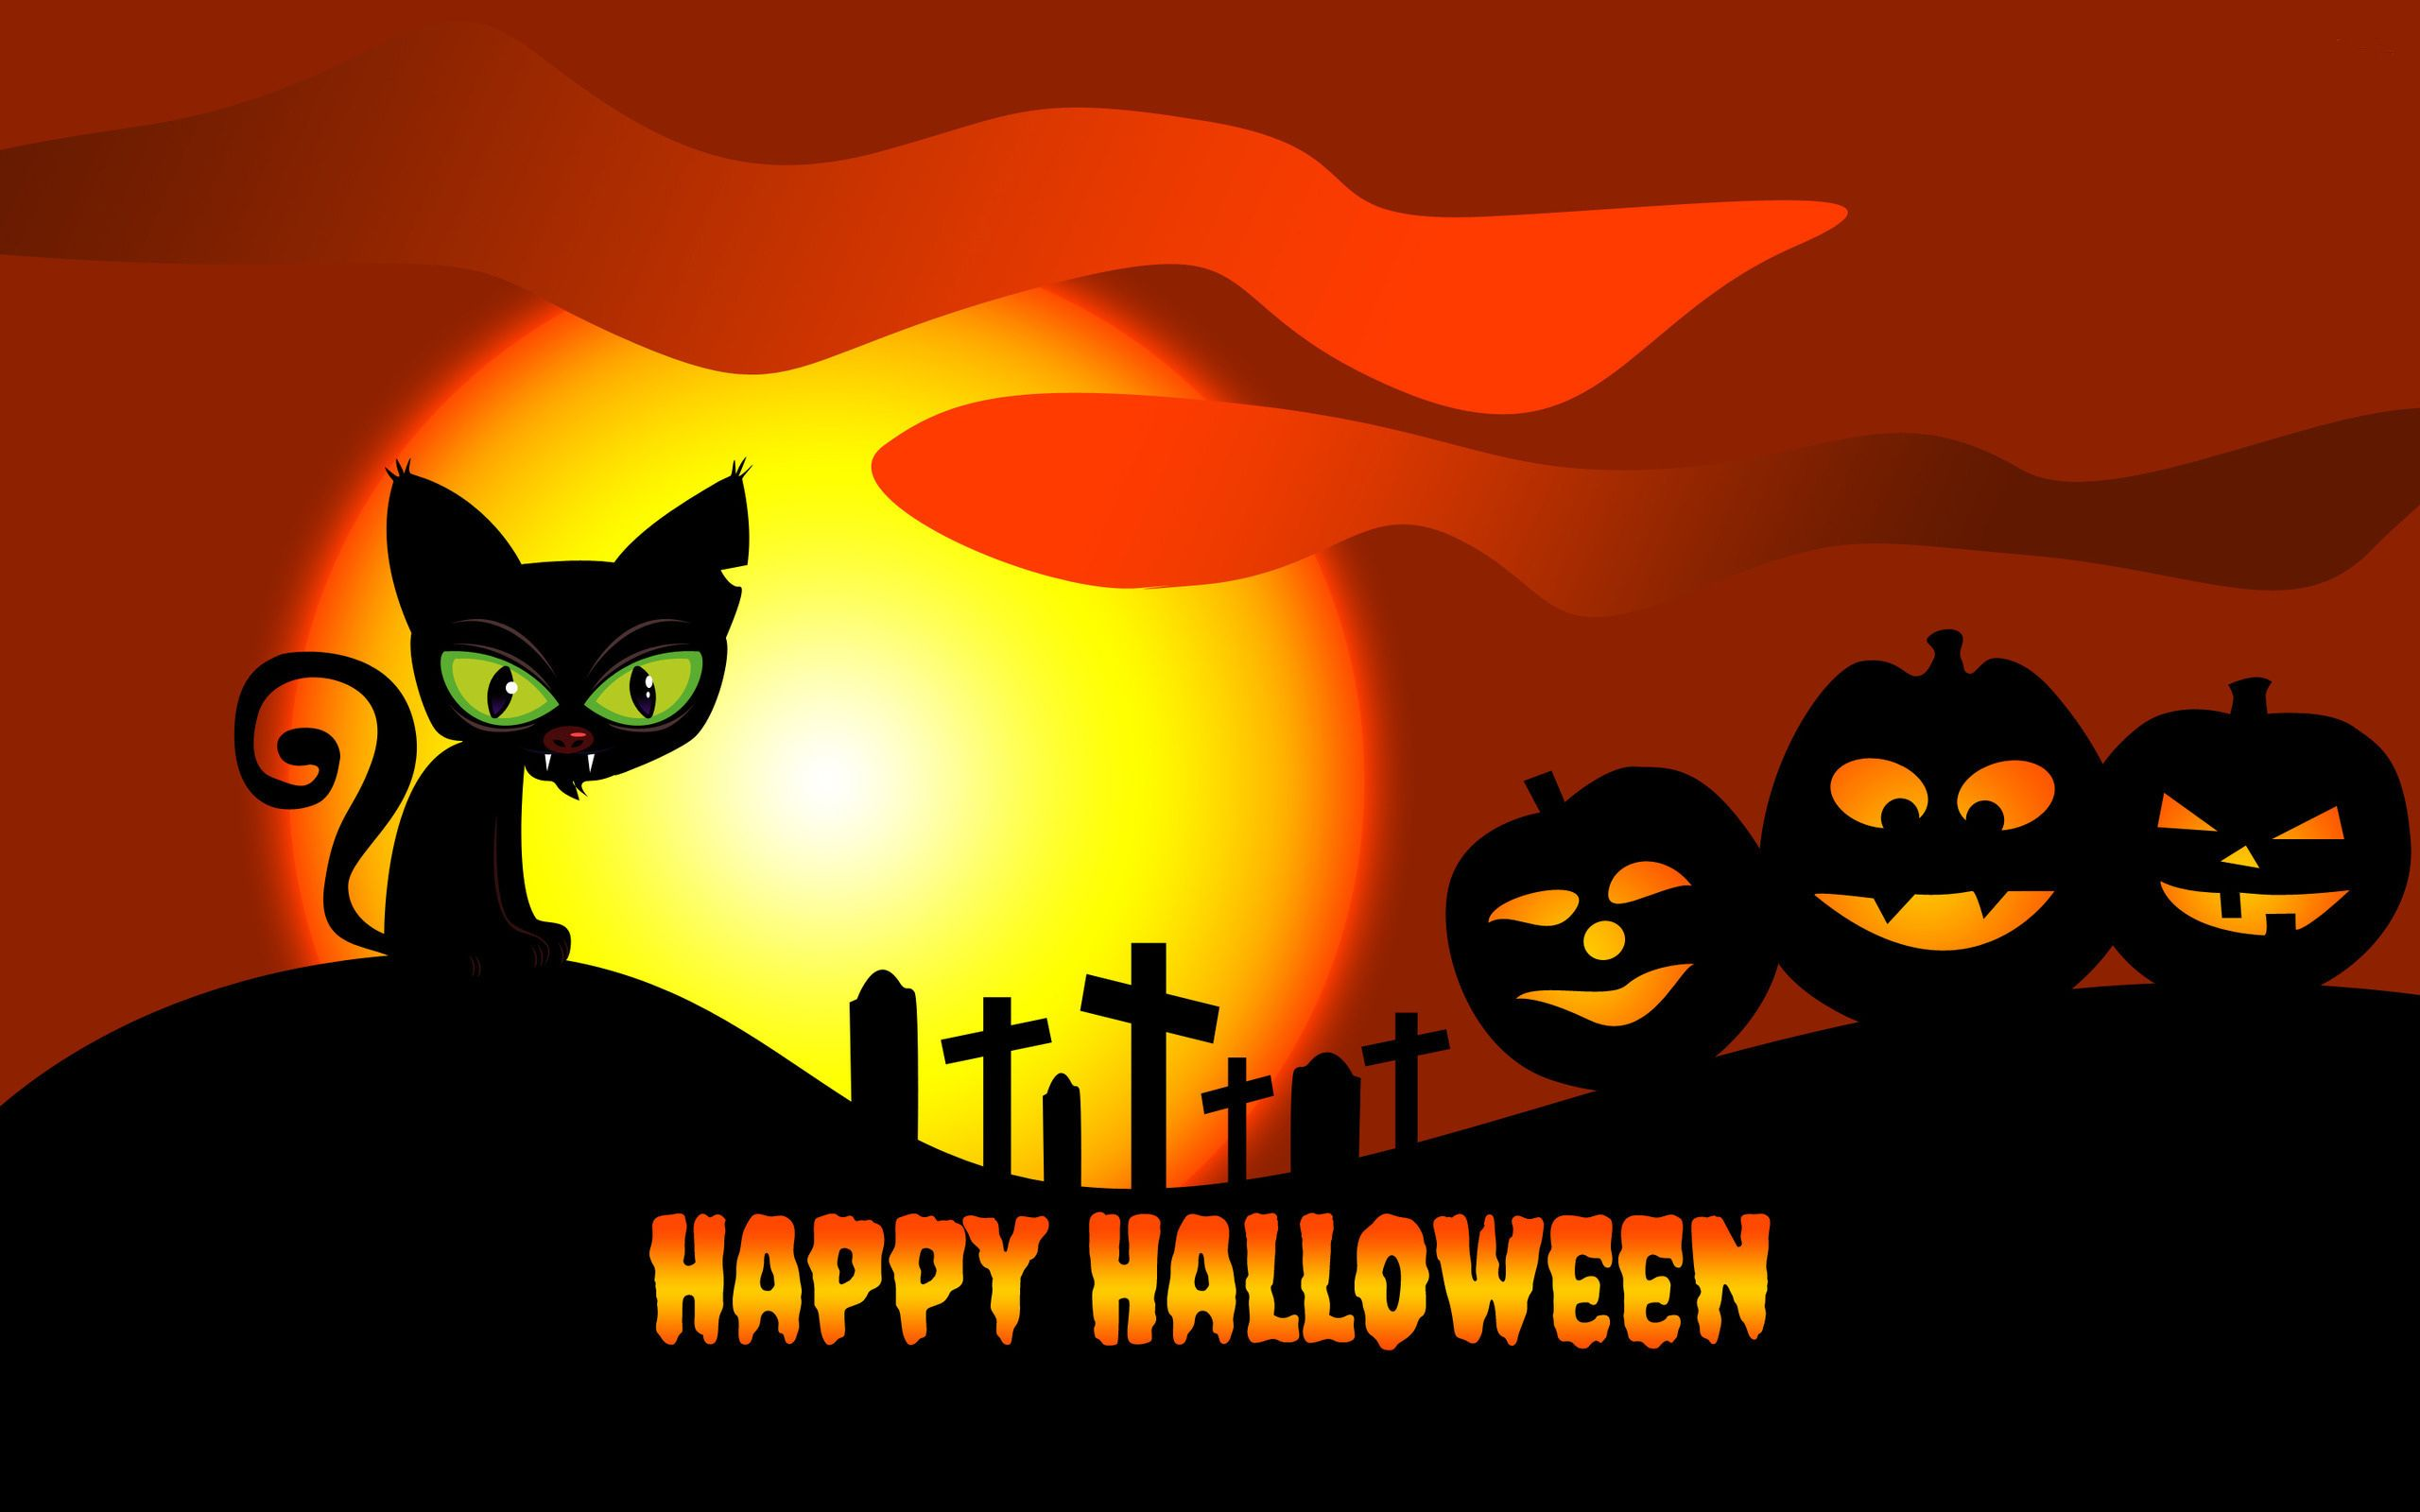 Fantastic Wallpaper Halloween High Resolution - db20cb1a81091548eb959f29287c3d26  Snapshot_749878.jpg